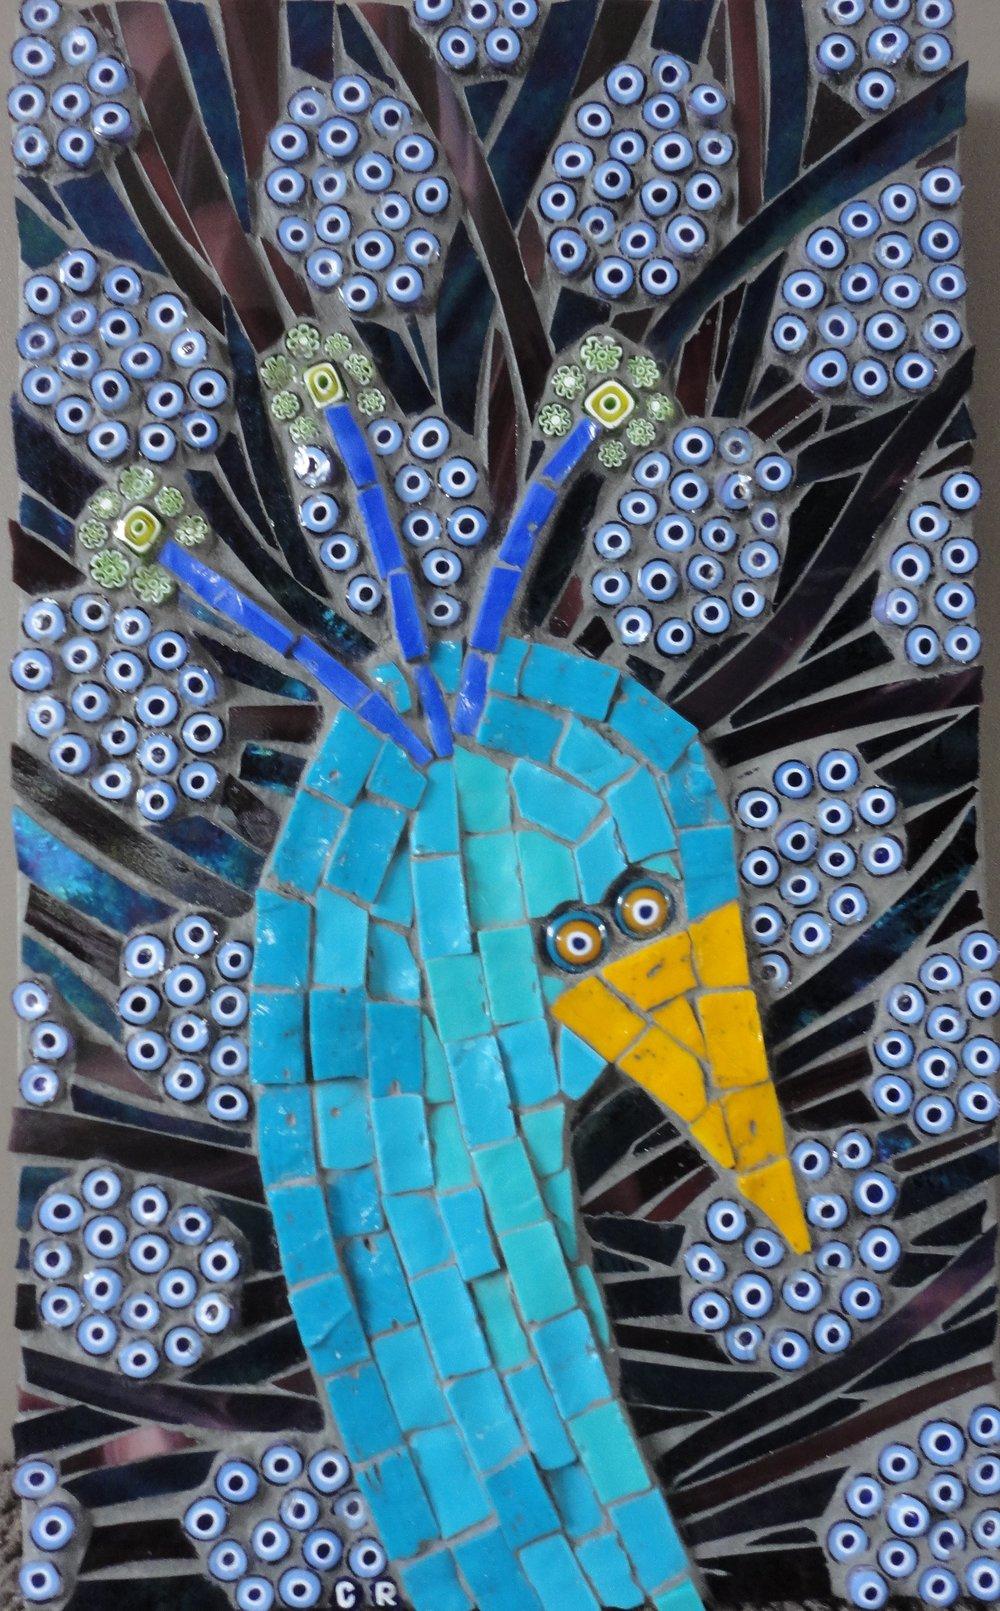 Peacock (Millefiori, Smalti, Stained Glass, Glass Eye Fusions)